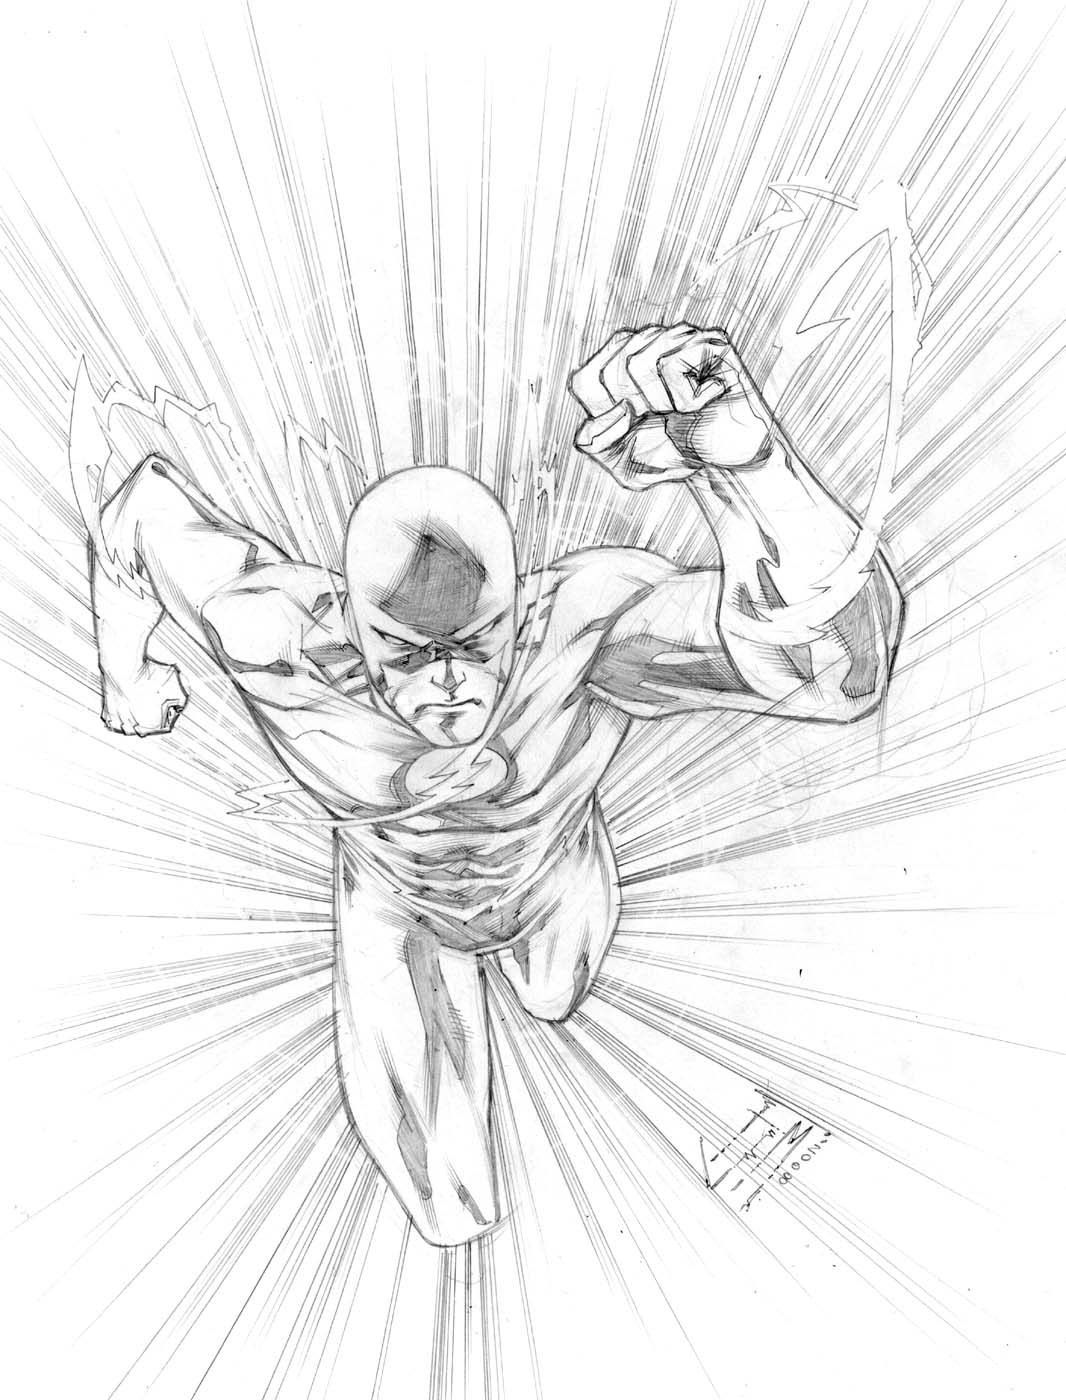 - 10 Pics Of DC Comics Flash Coloring Pages - Flash Superhero DC